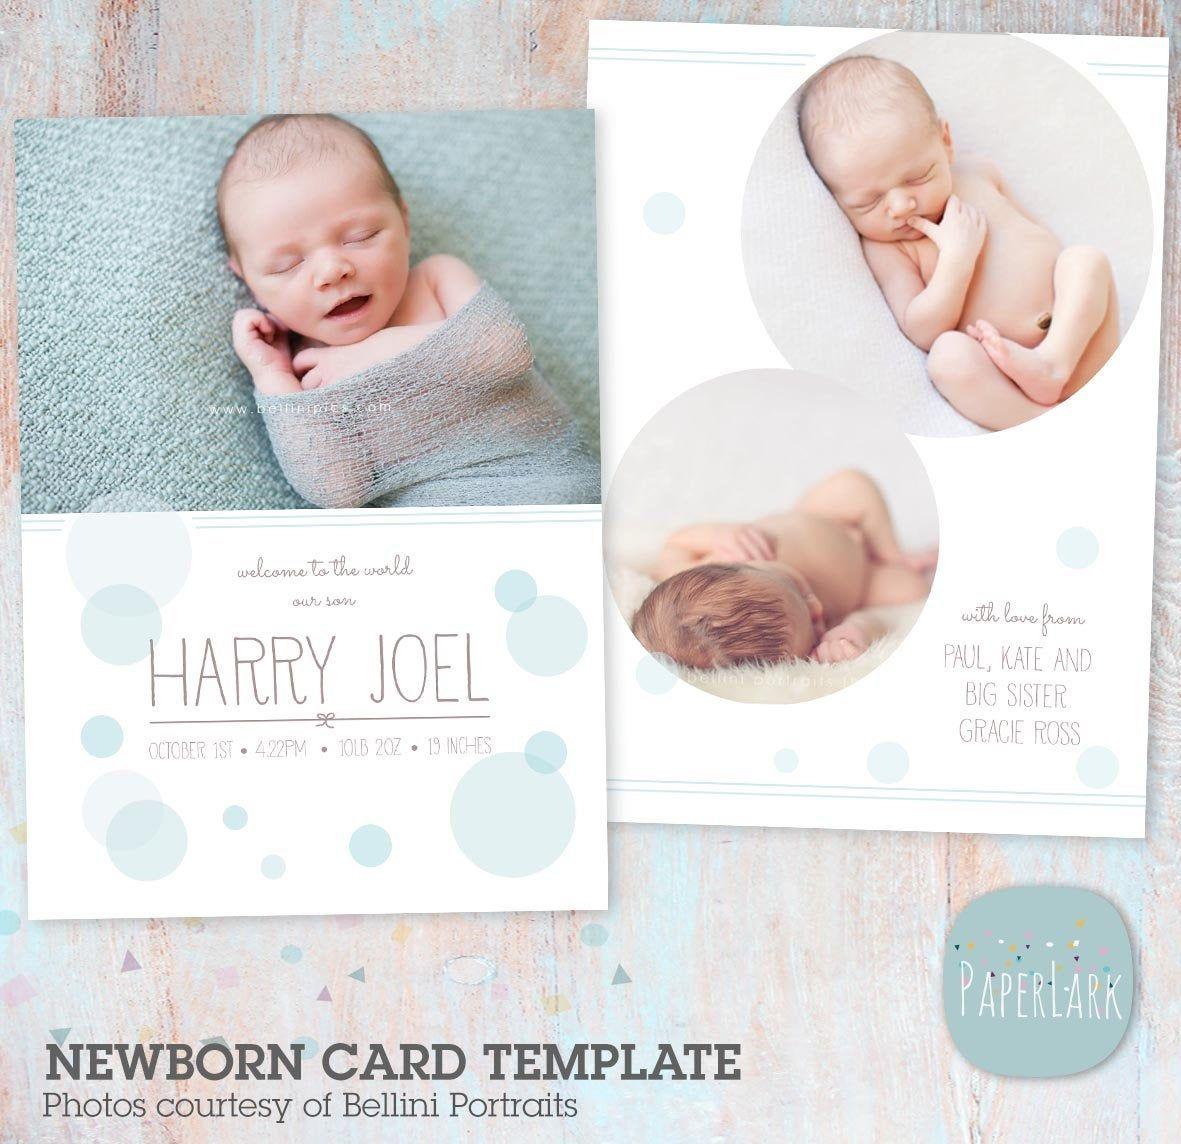 Birth Announcement Baby Boy Card Newborn Greeting Card Baby Etsy Newborn Birth Announcements Newborn Birth Birth Announcement